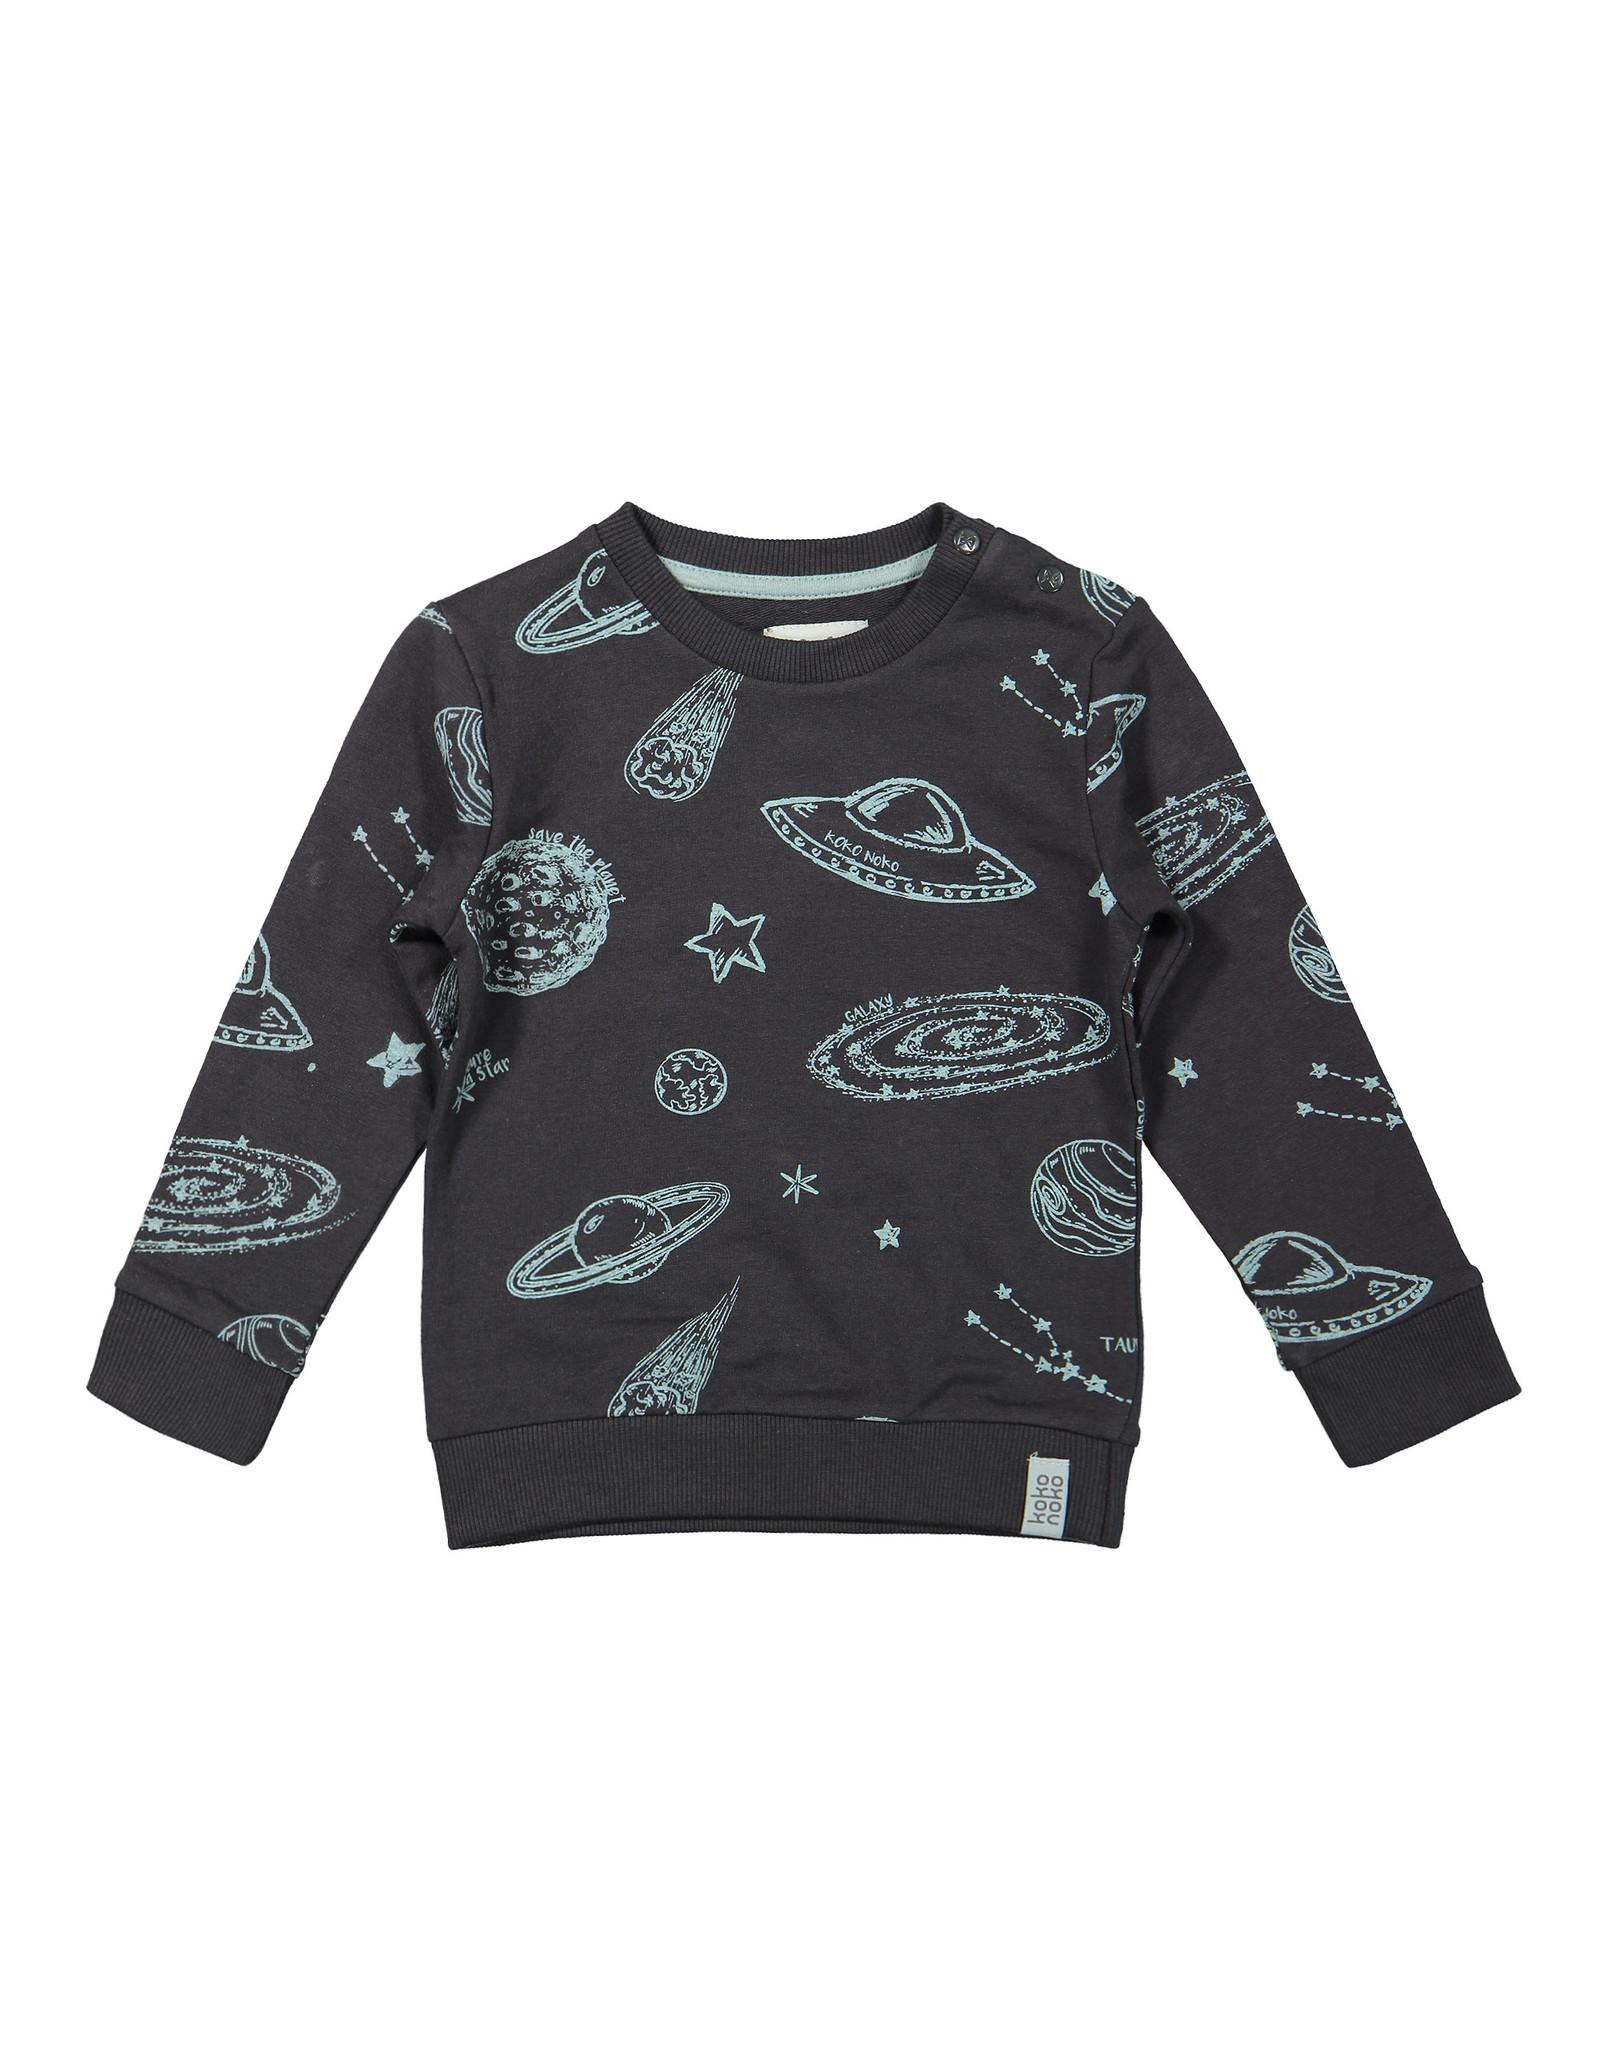 Koko Noko Boys Sweater ls Dark grey